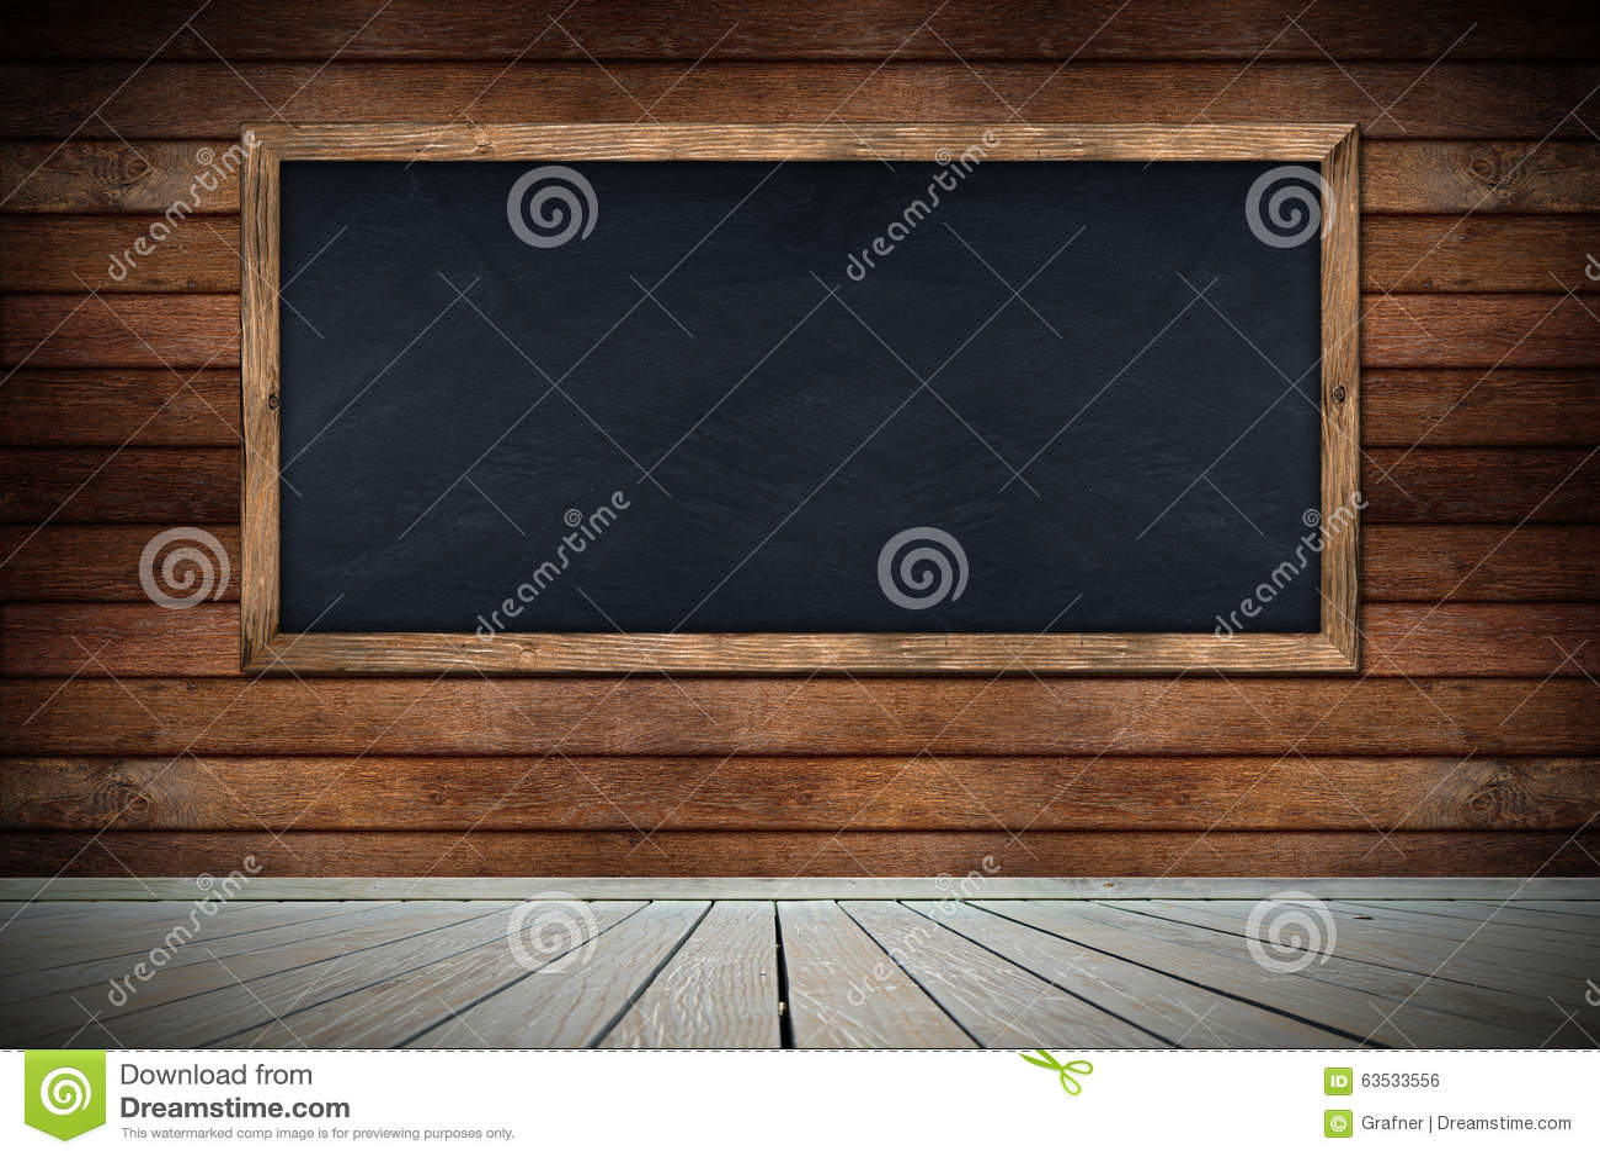 Classroom Blackboard Design ~ Blackboard classroom stock photo image